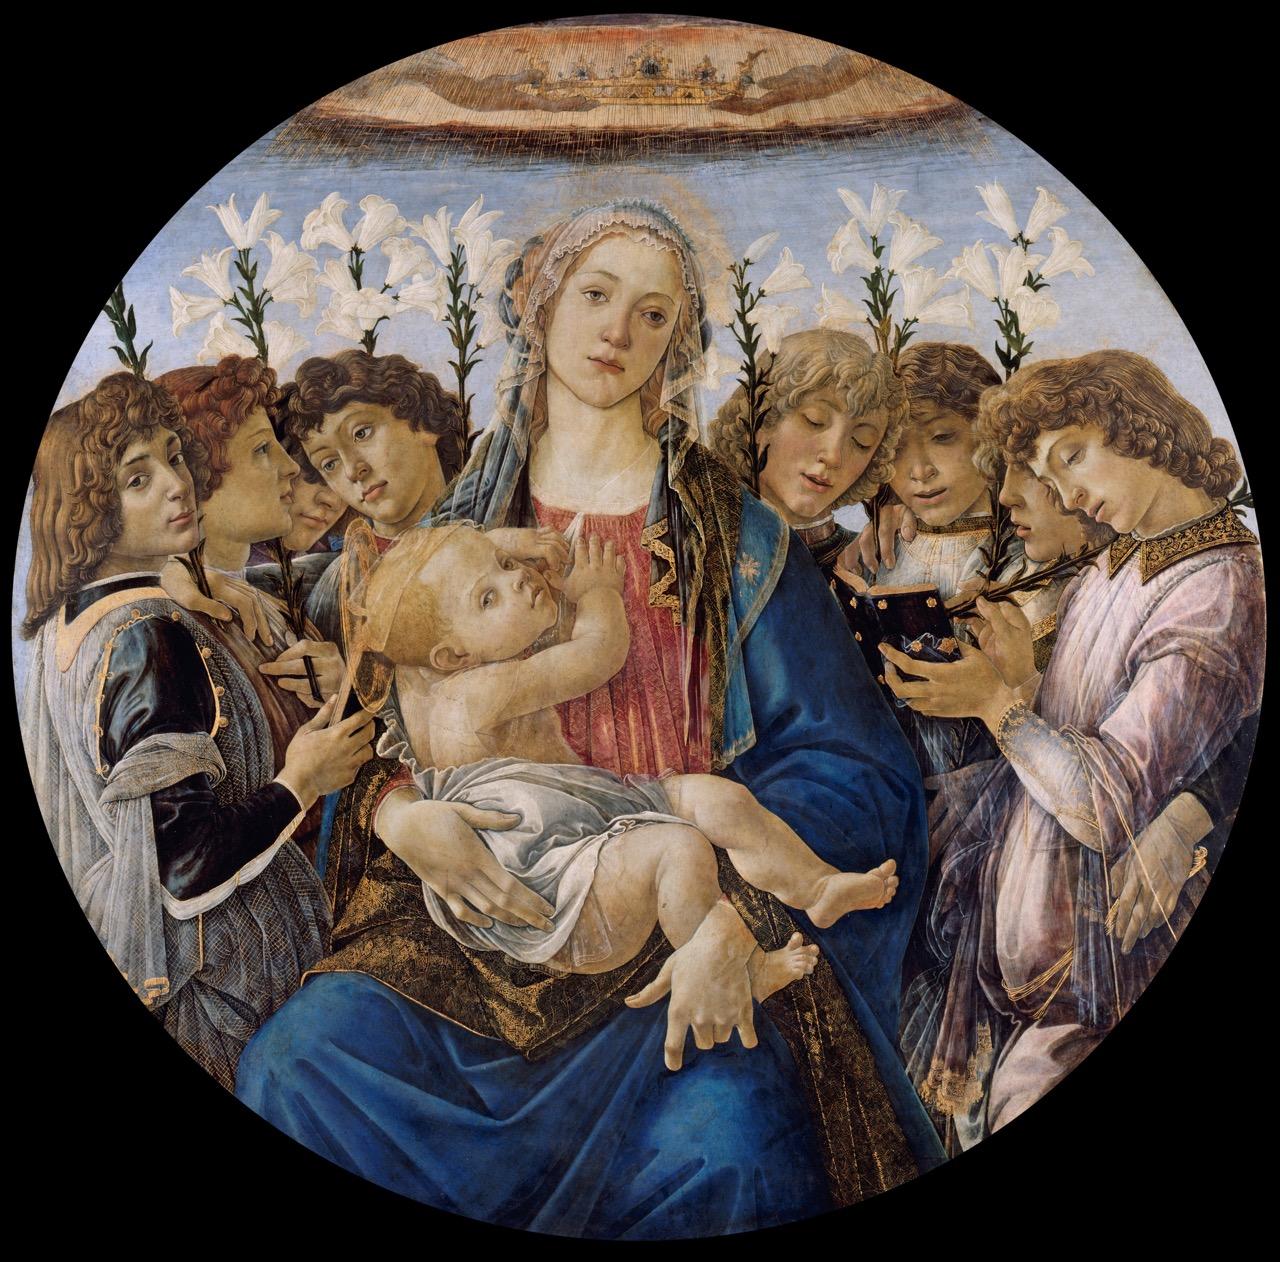 Madonna com o menino e coro de oito meninos, de Sandro Botticelli (1478). Staalich Mussen, Berlin.